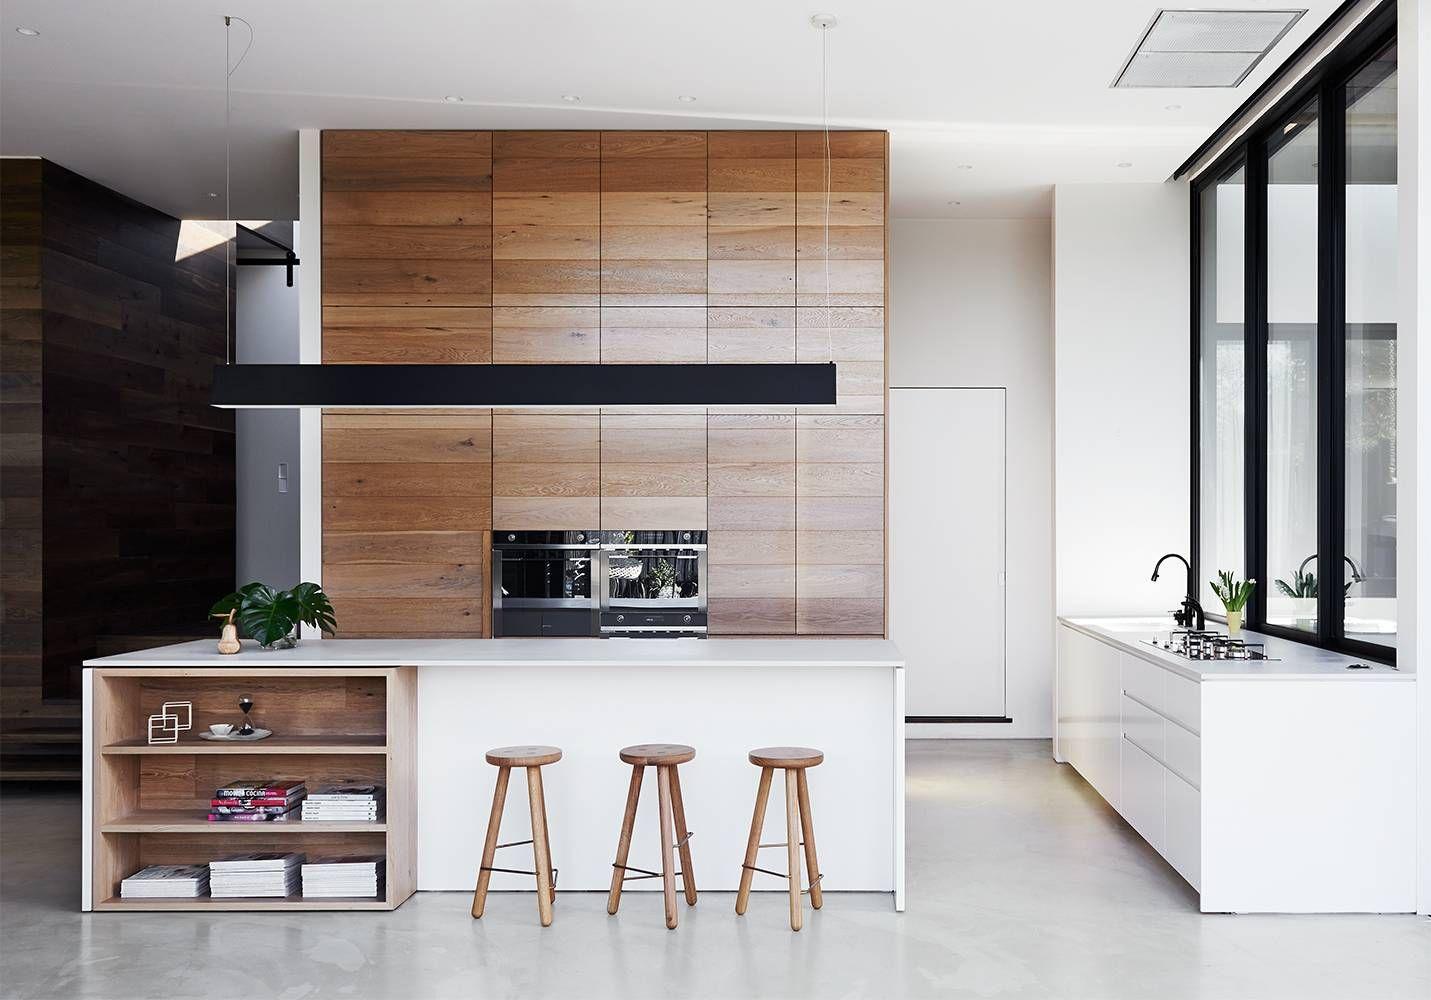 Ideen für küchenideen white smoked american oak timber looks fantastic here in the